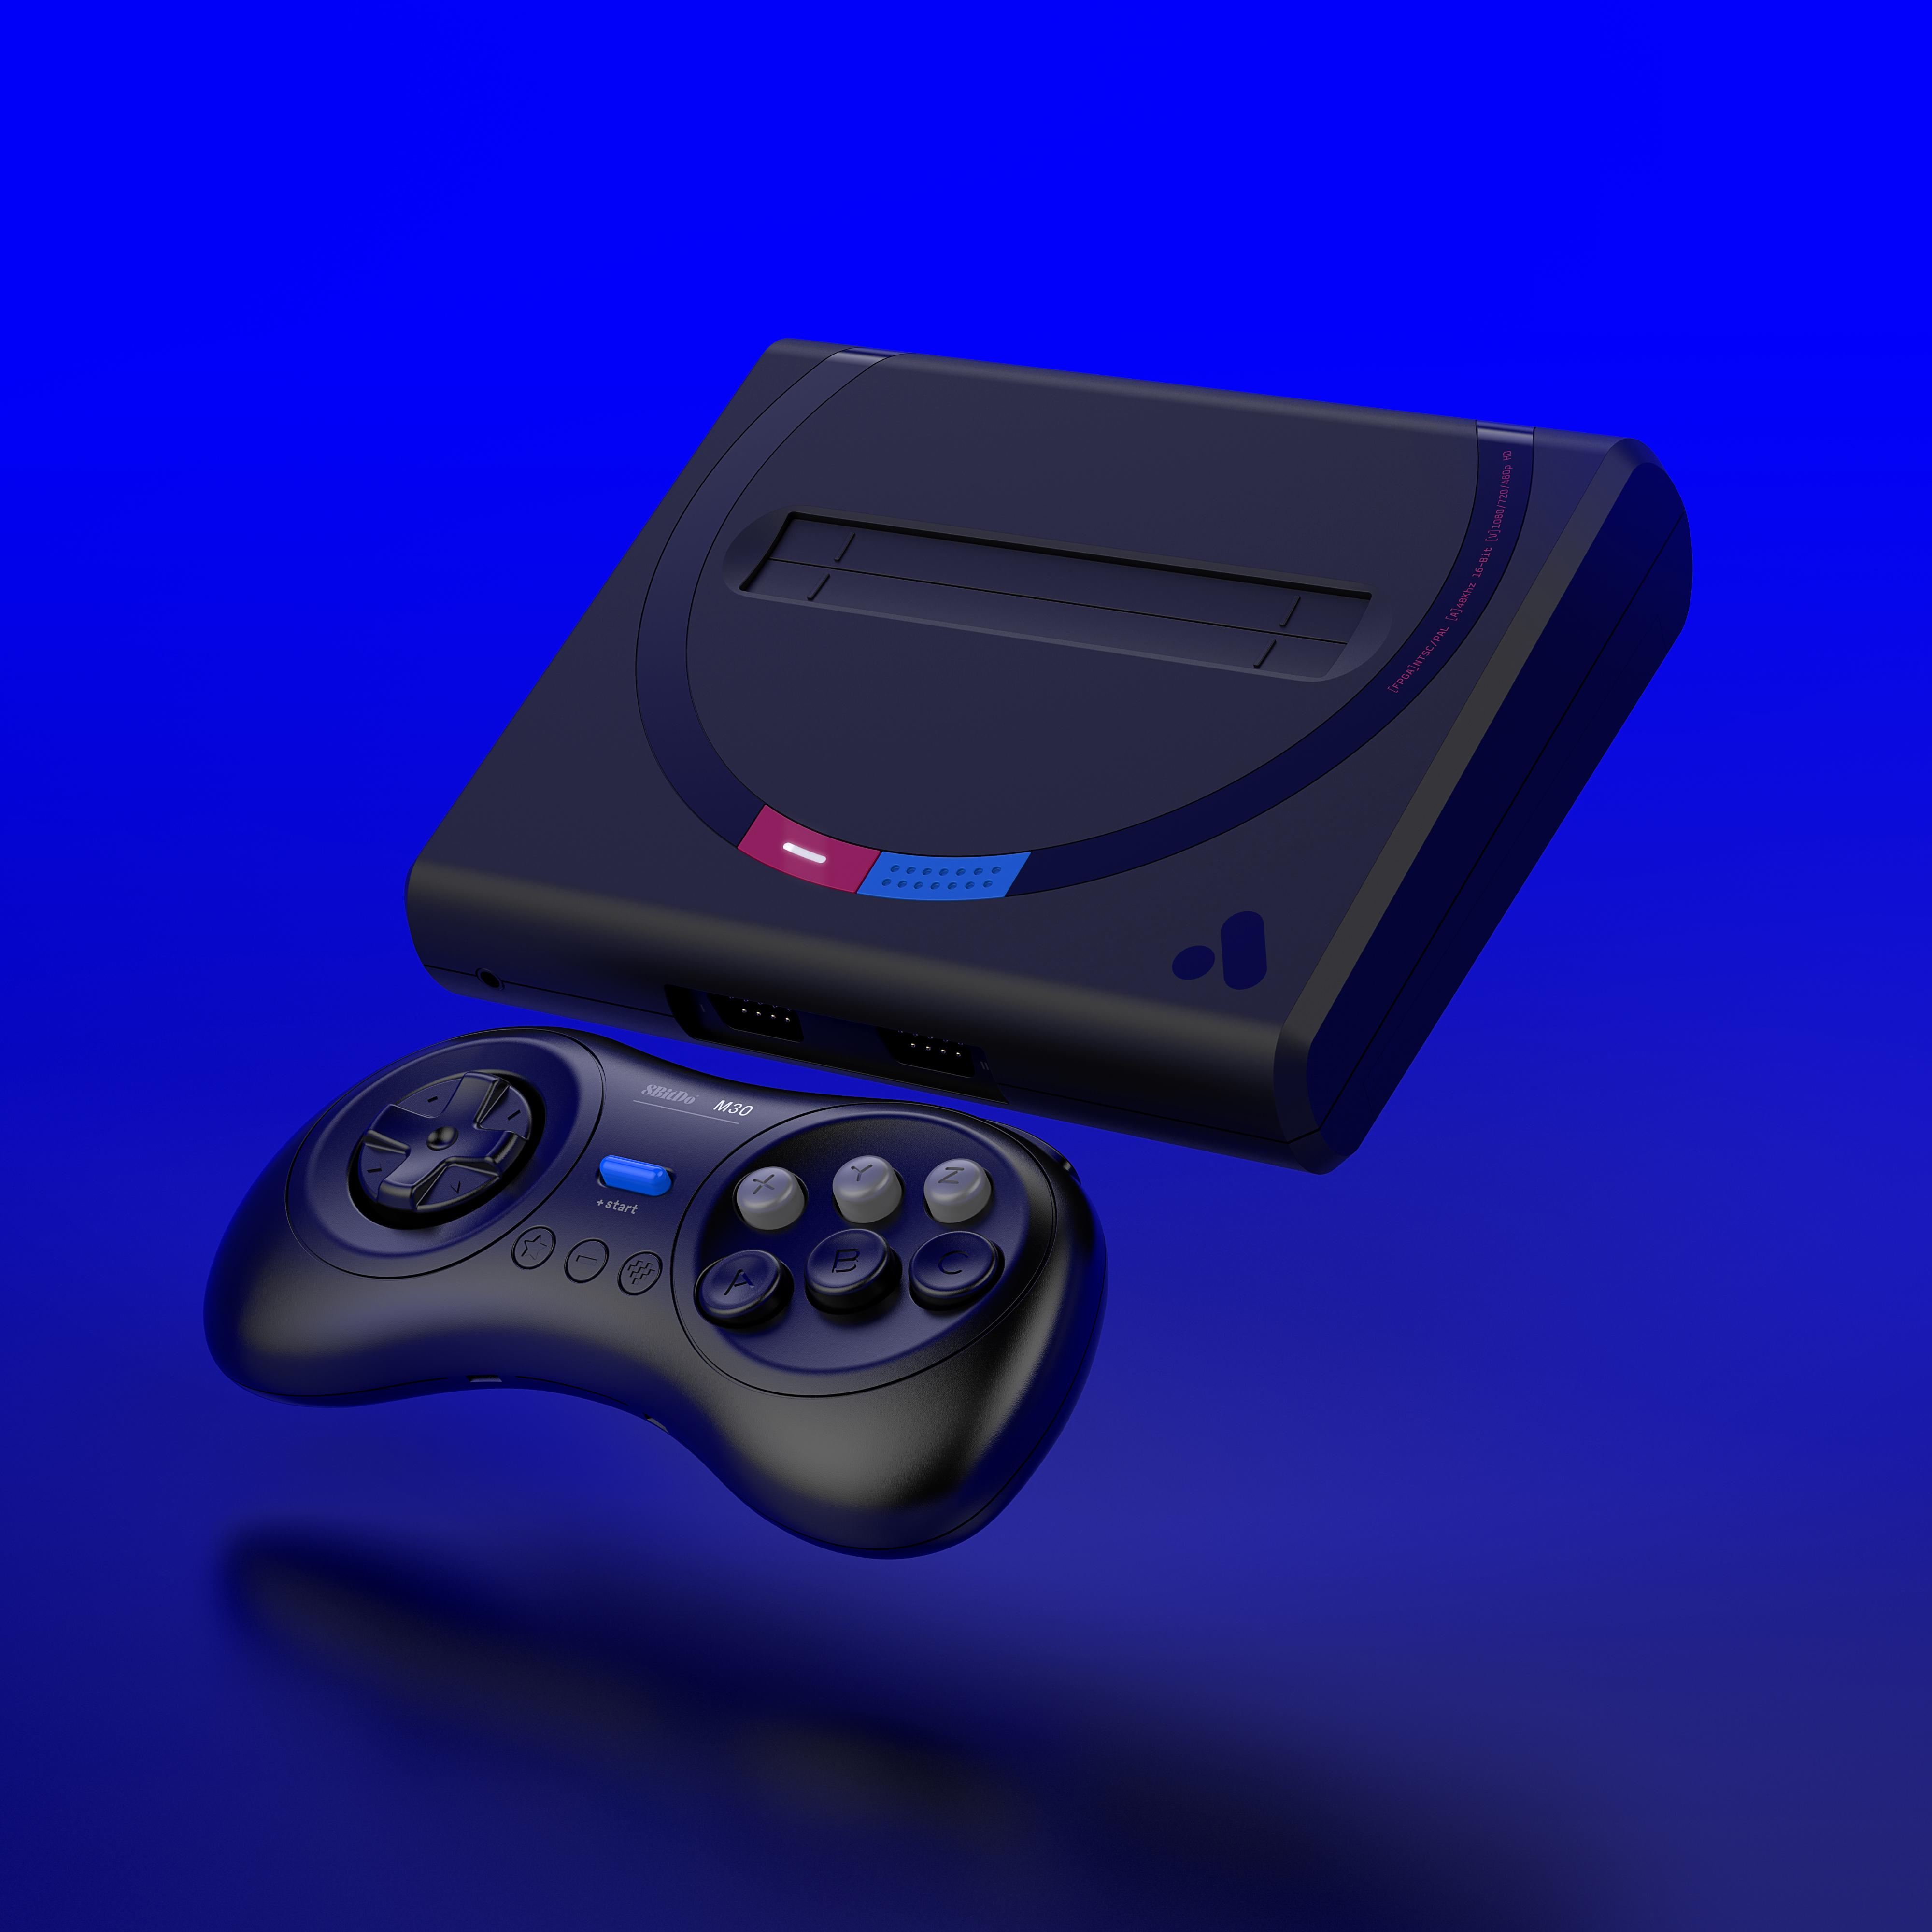 Sega Genesis finally gets the HD console it deserves - Polygon